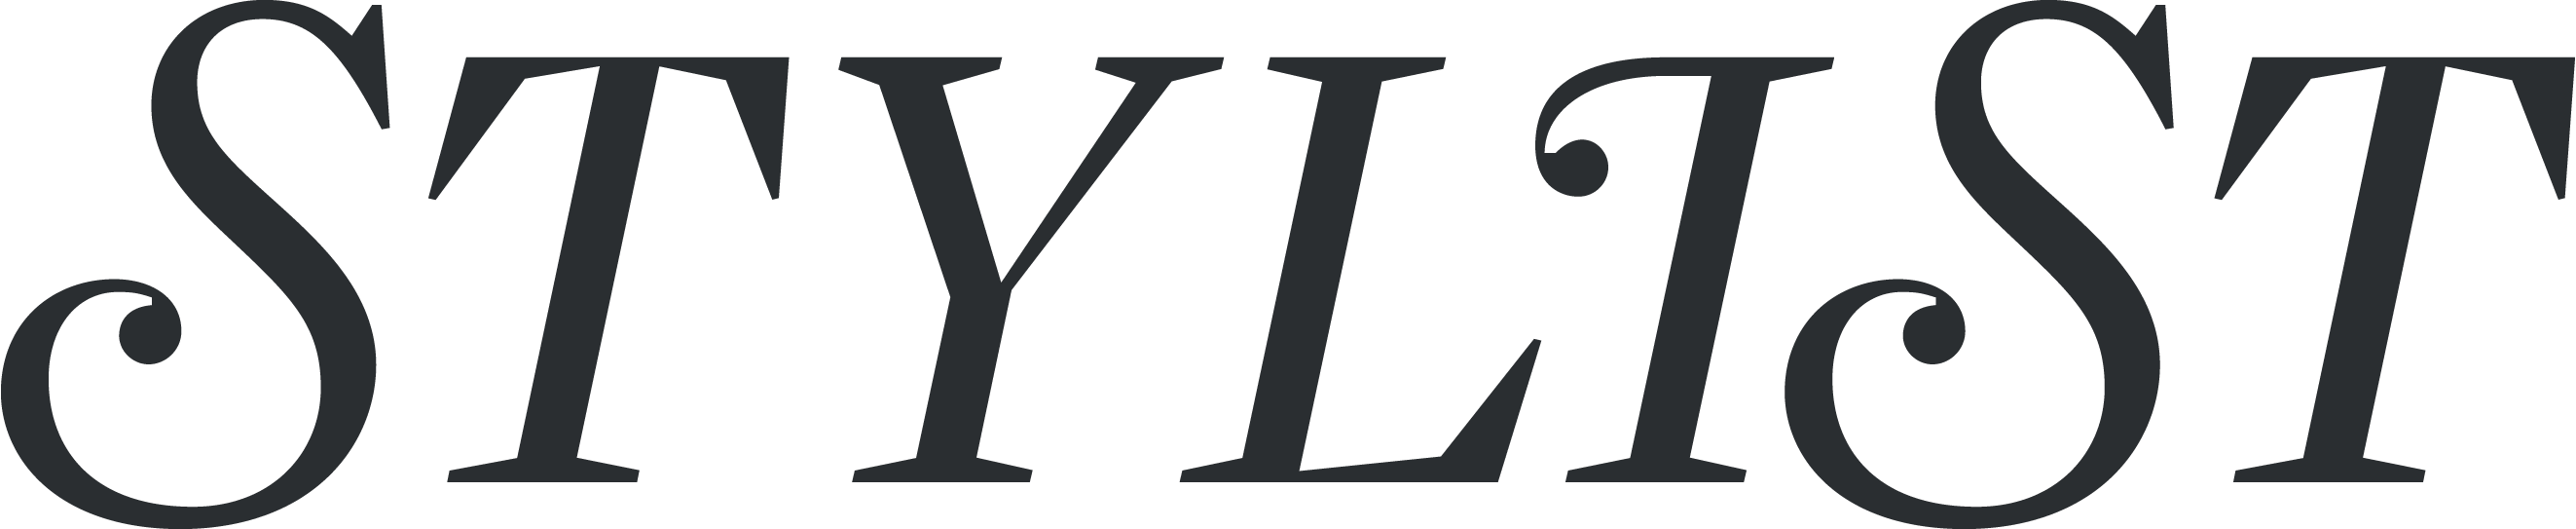 Stylist | The Stylist Group